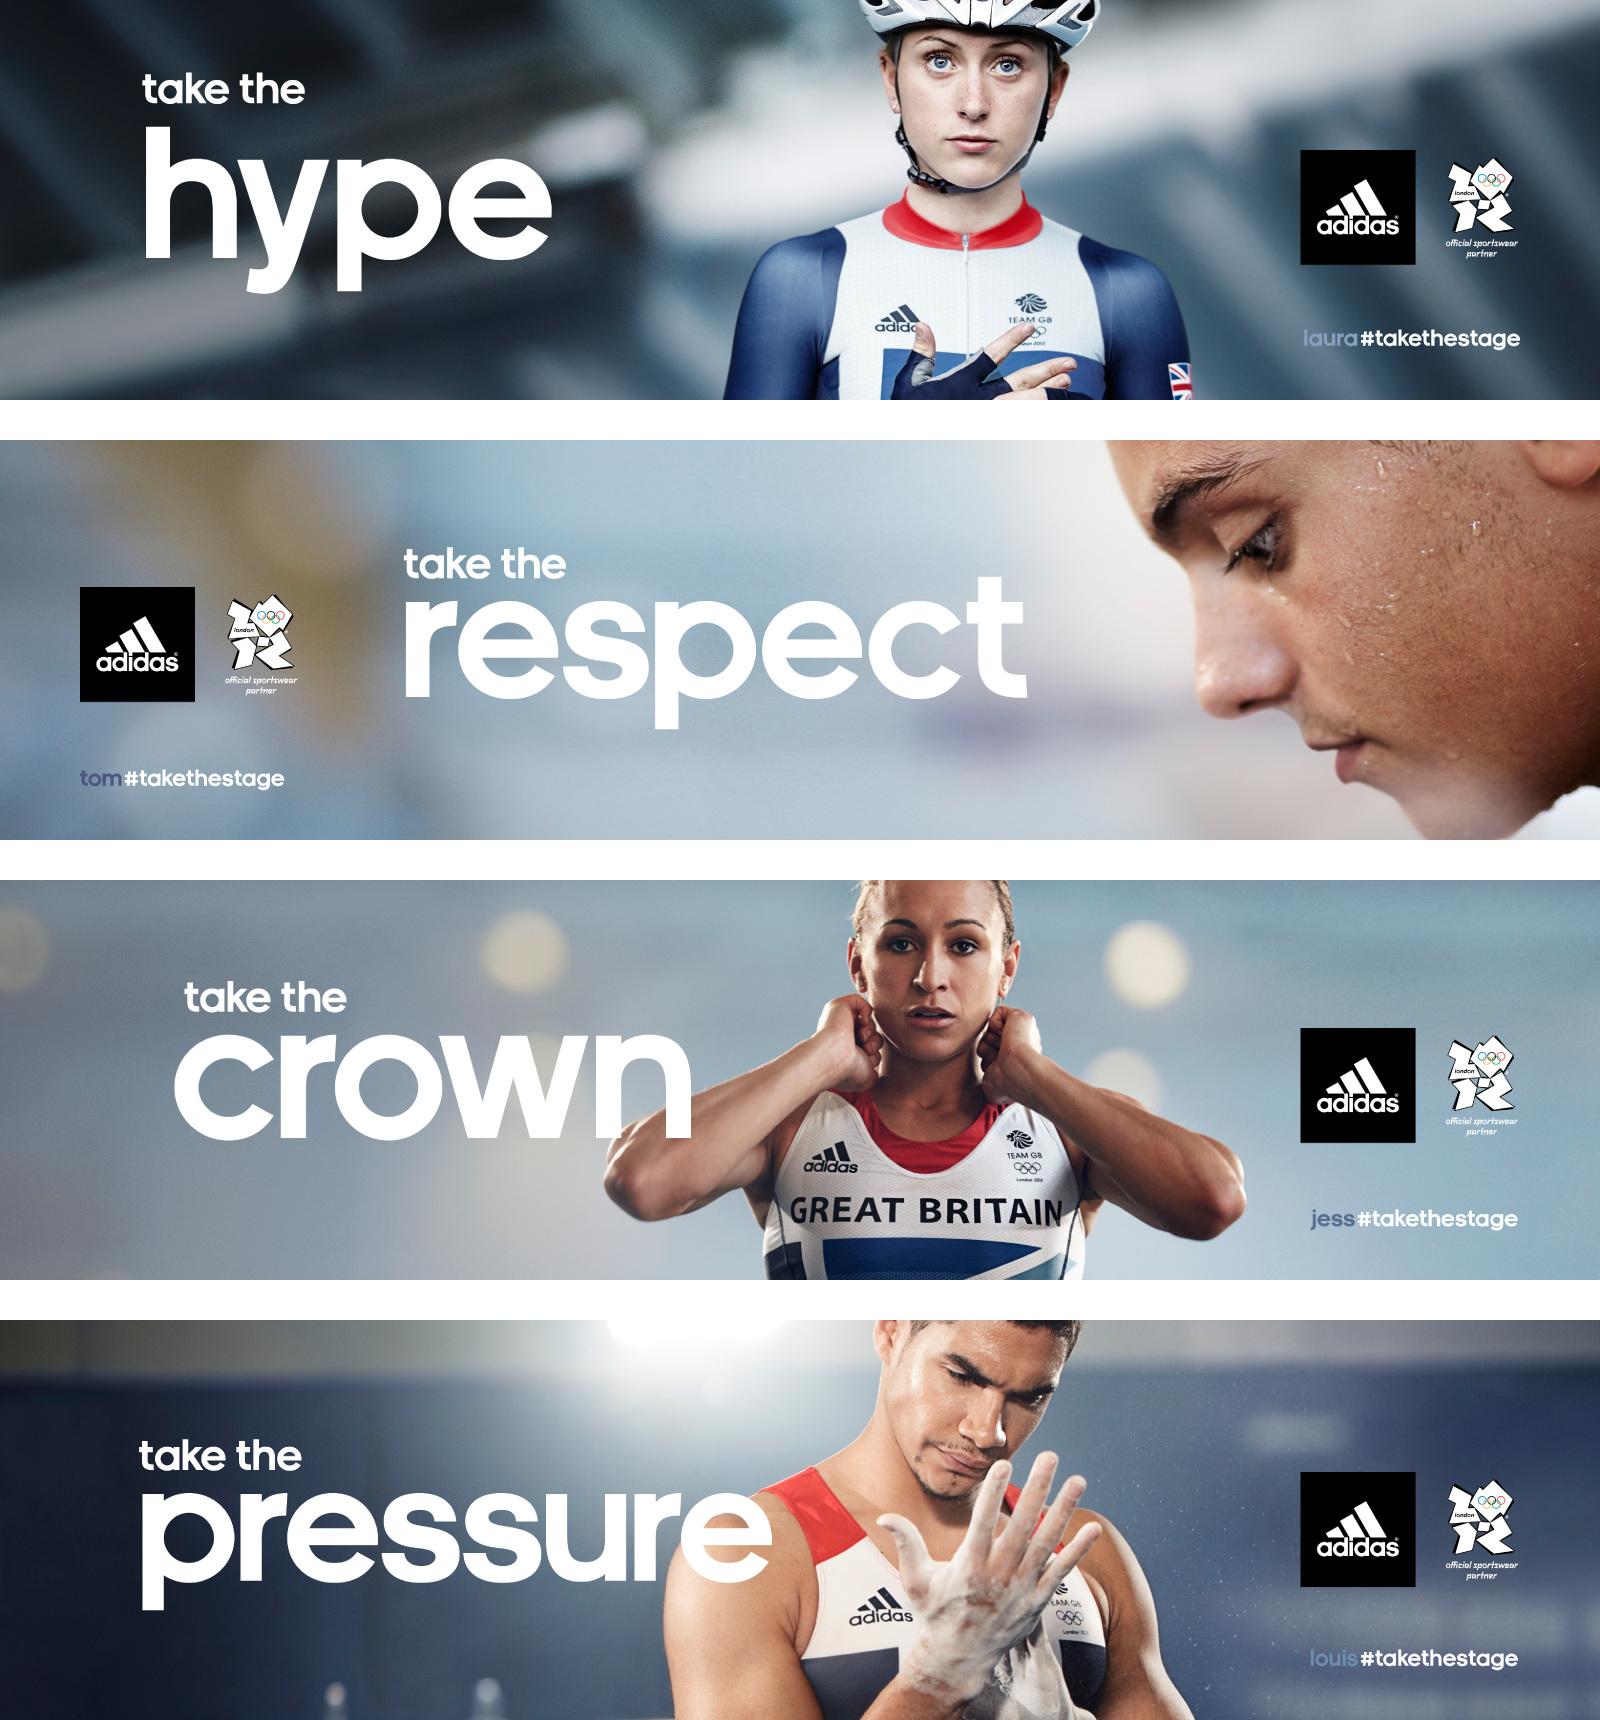 463975057fc Adidas Olympics 2012 - RZH